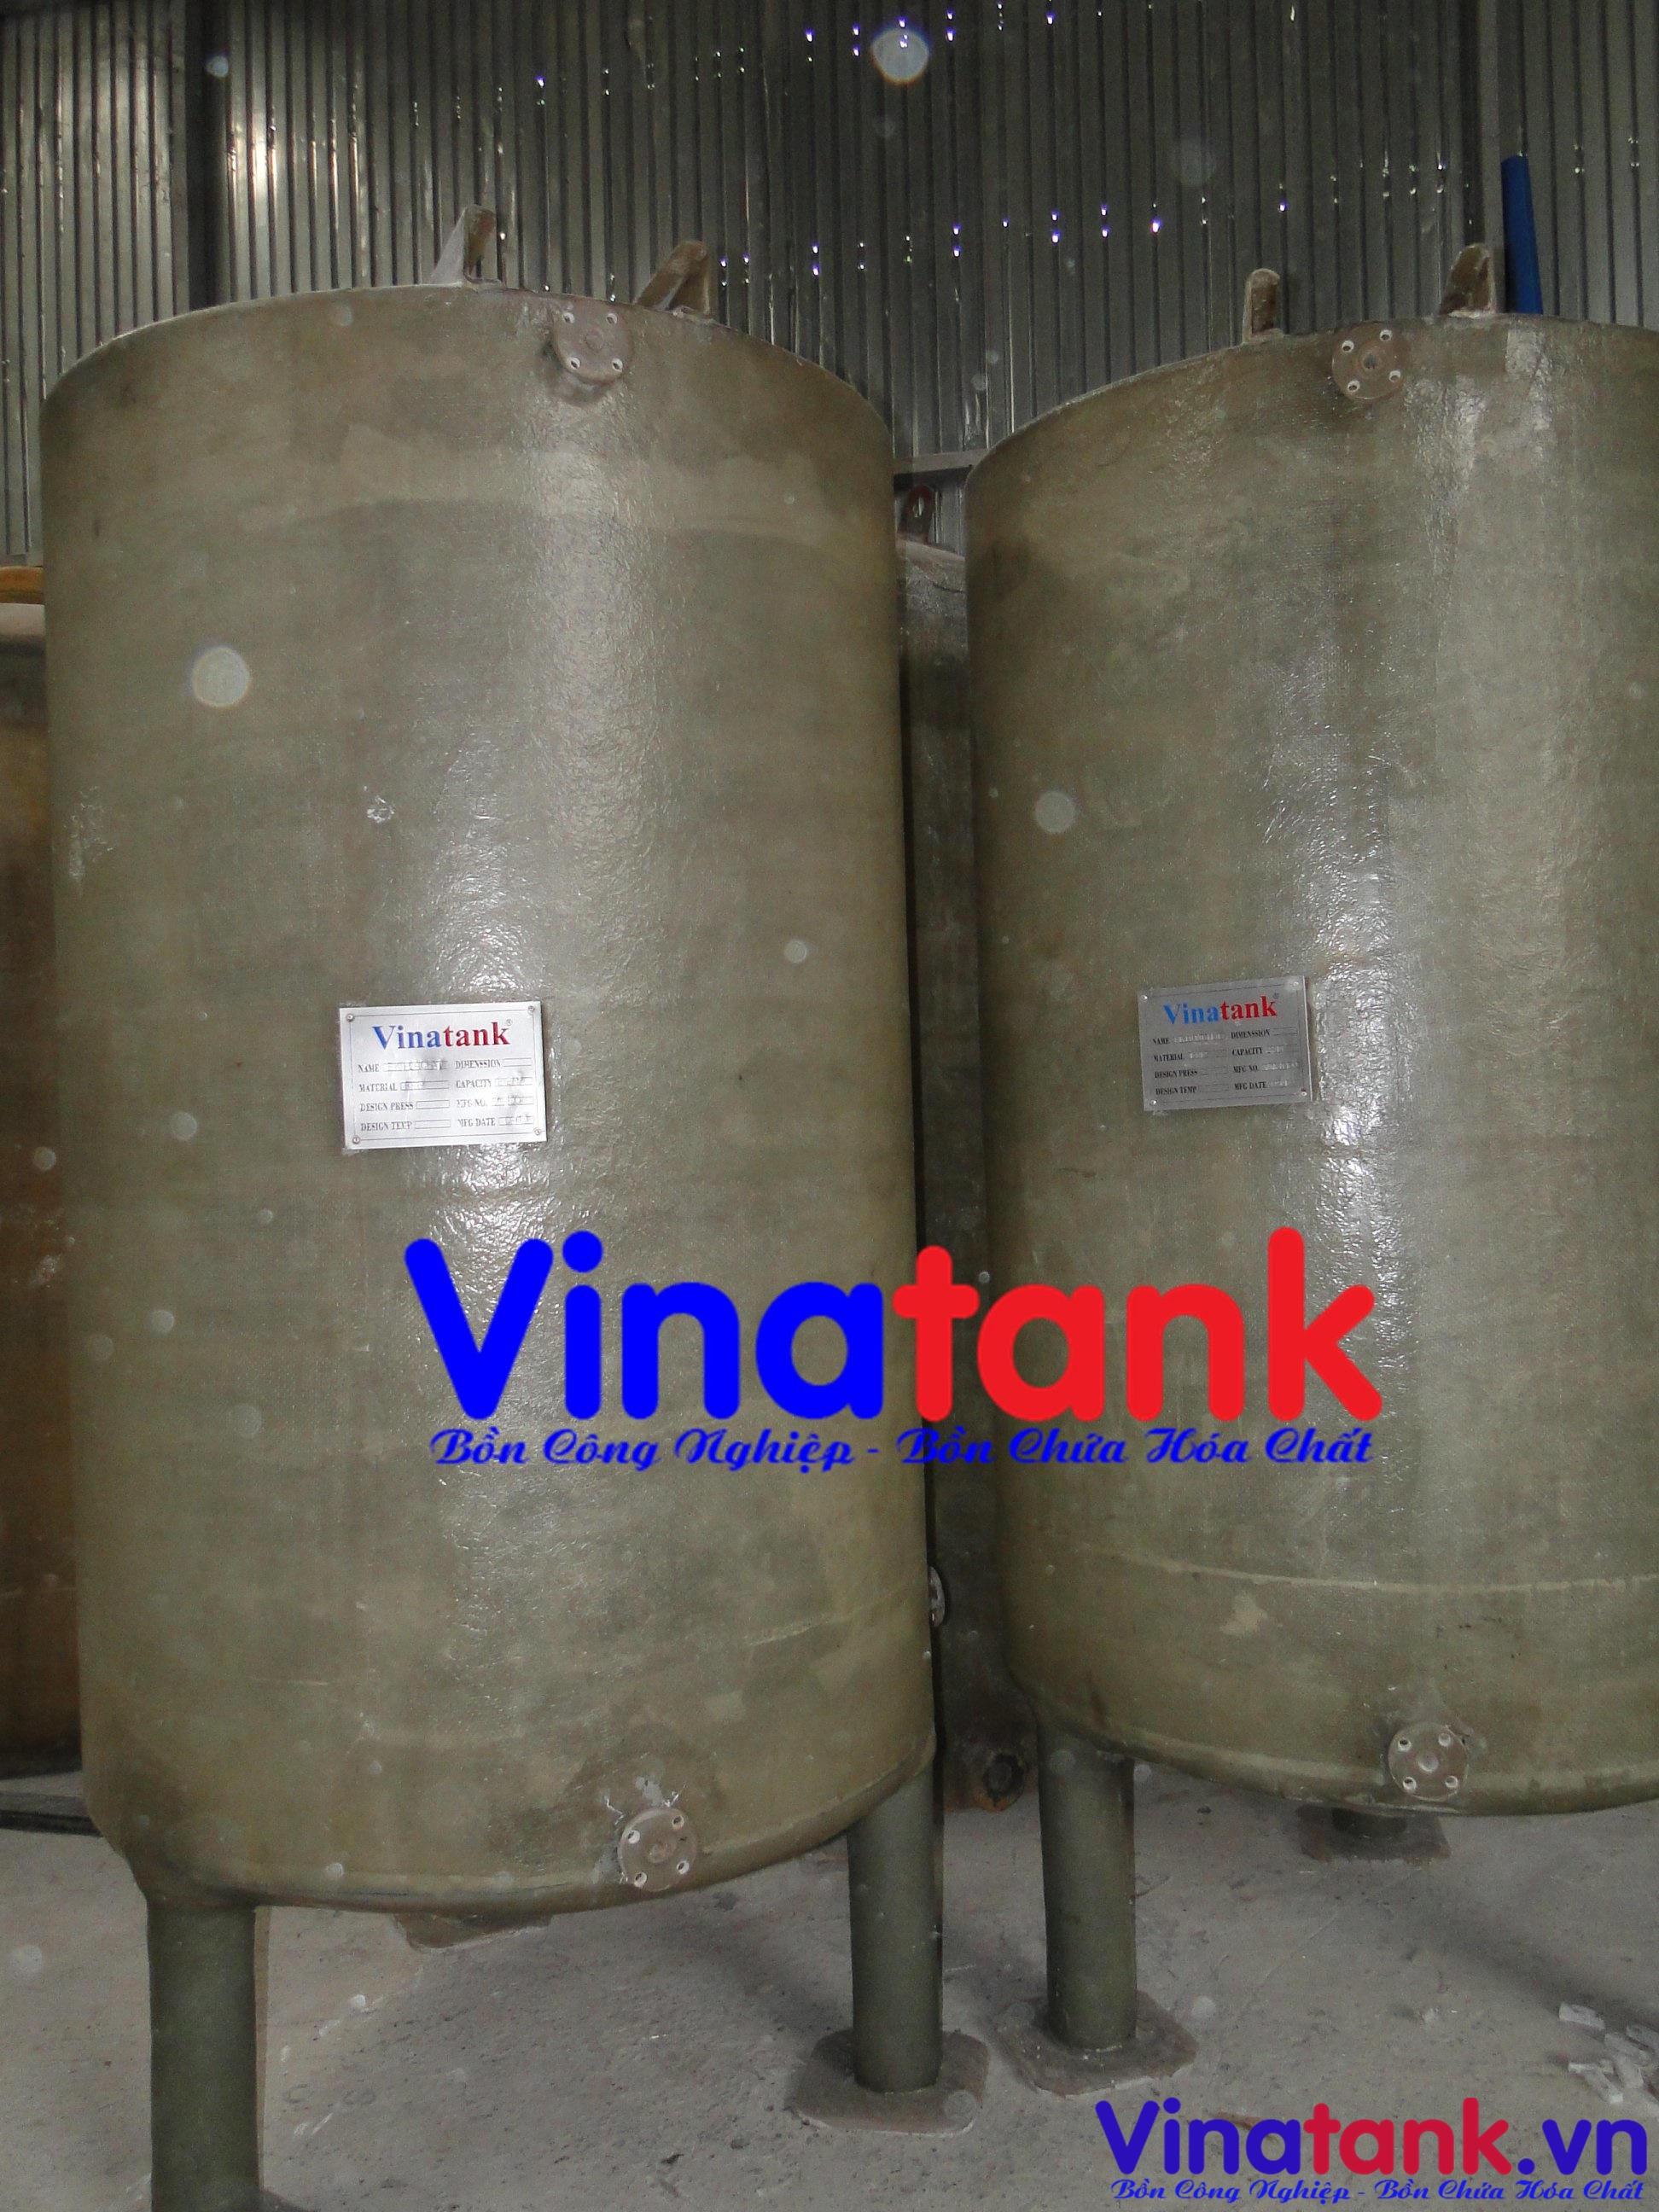 bồn composite frp chứa hóa chất, bồn chứa hóa chất, bồn composite chứa hóa chất, bon frp chua hoa chat